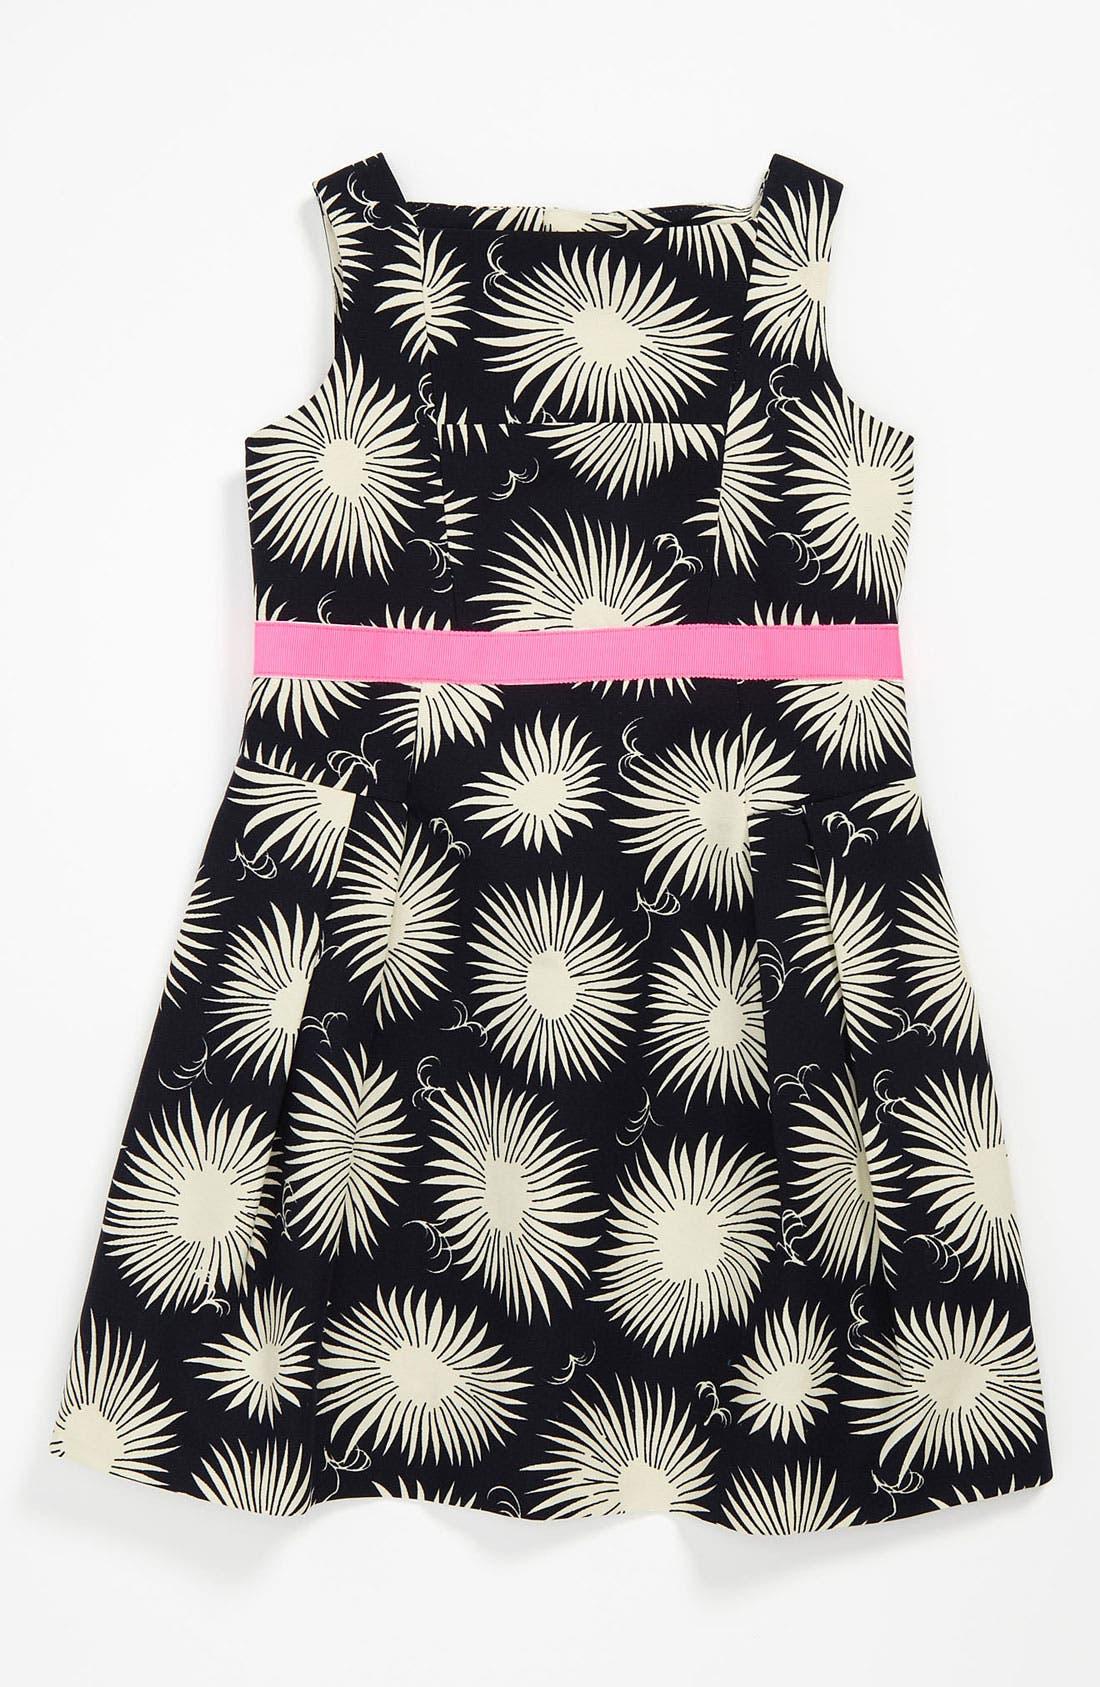 Alternate Image 1 Selected - Milly Minis 'Colette' Shift Dress (Little Girls & Big Girls)